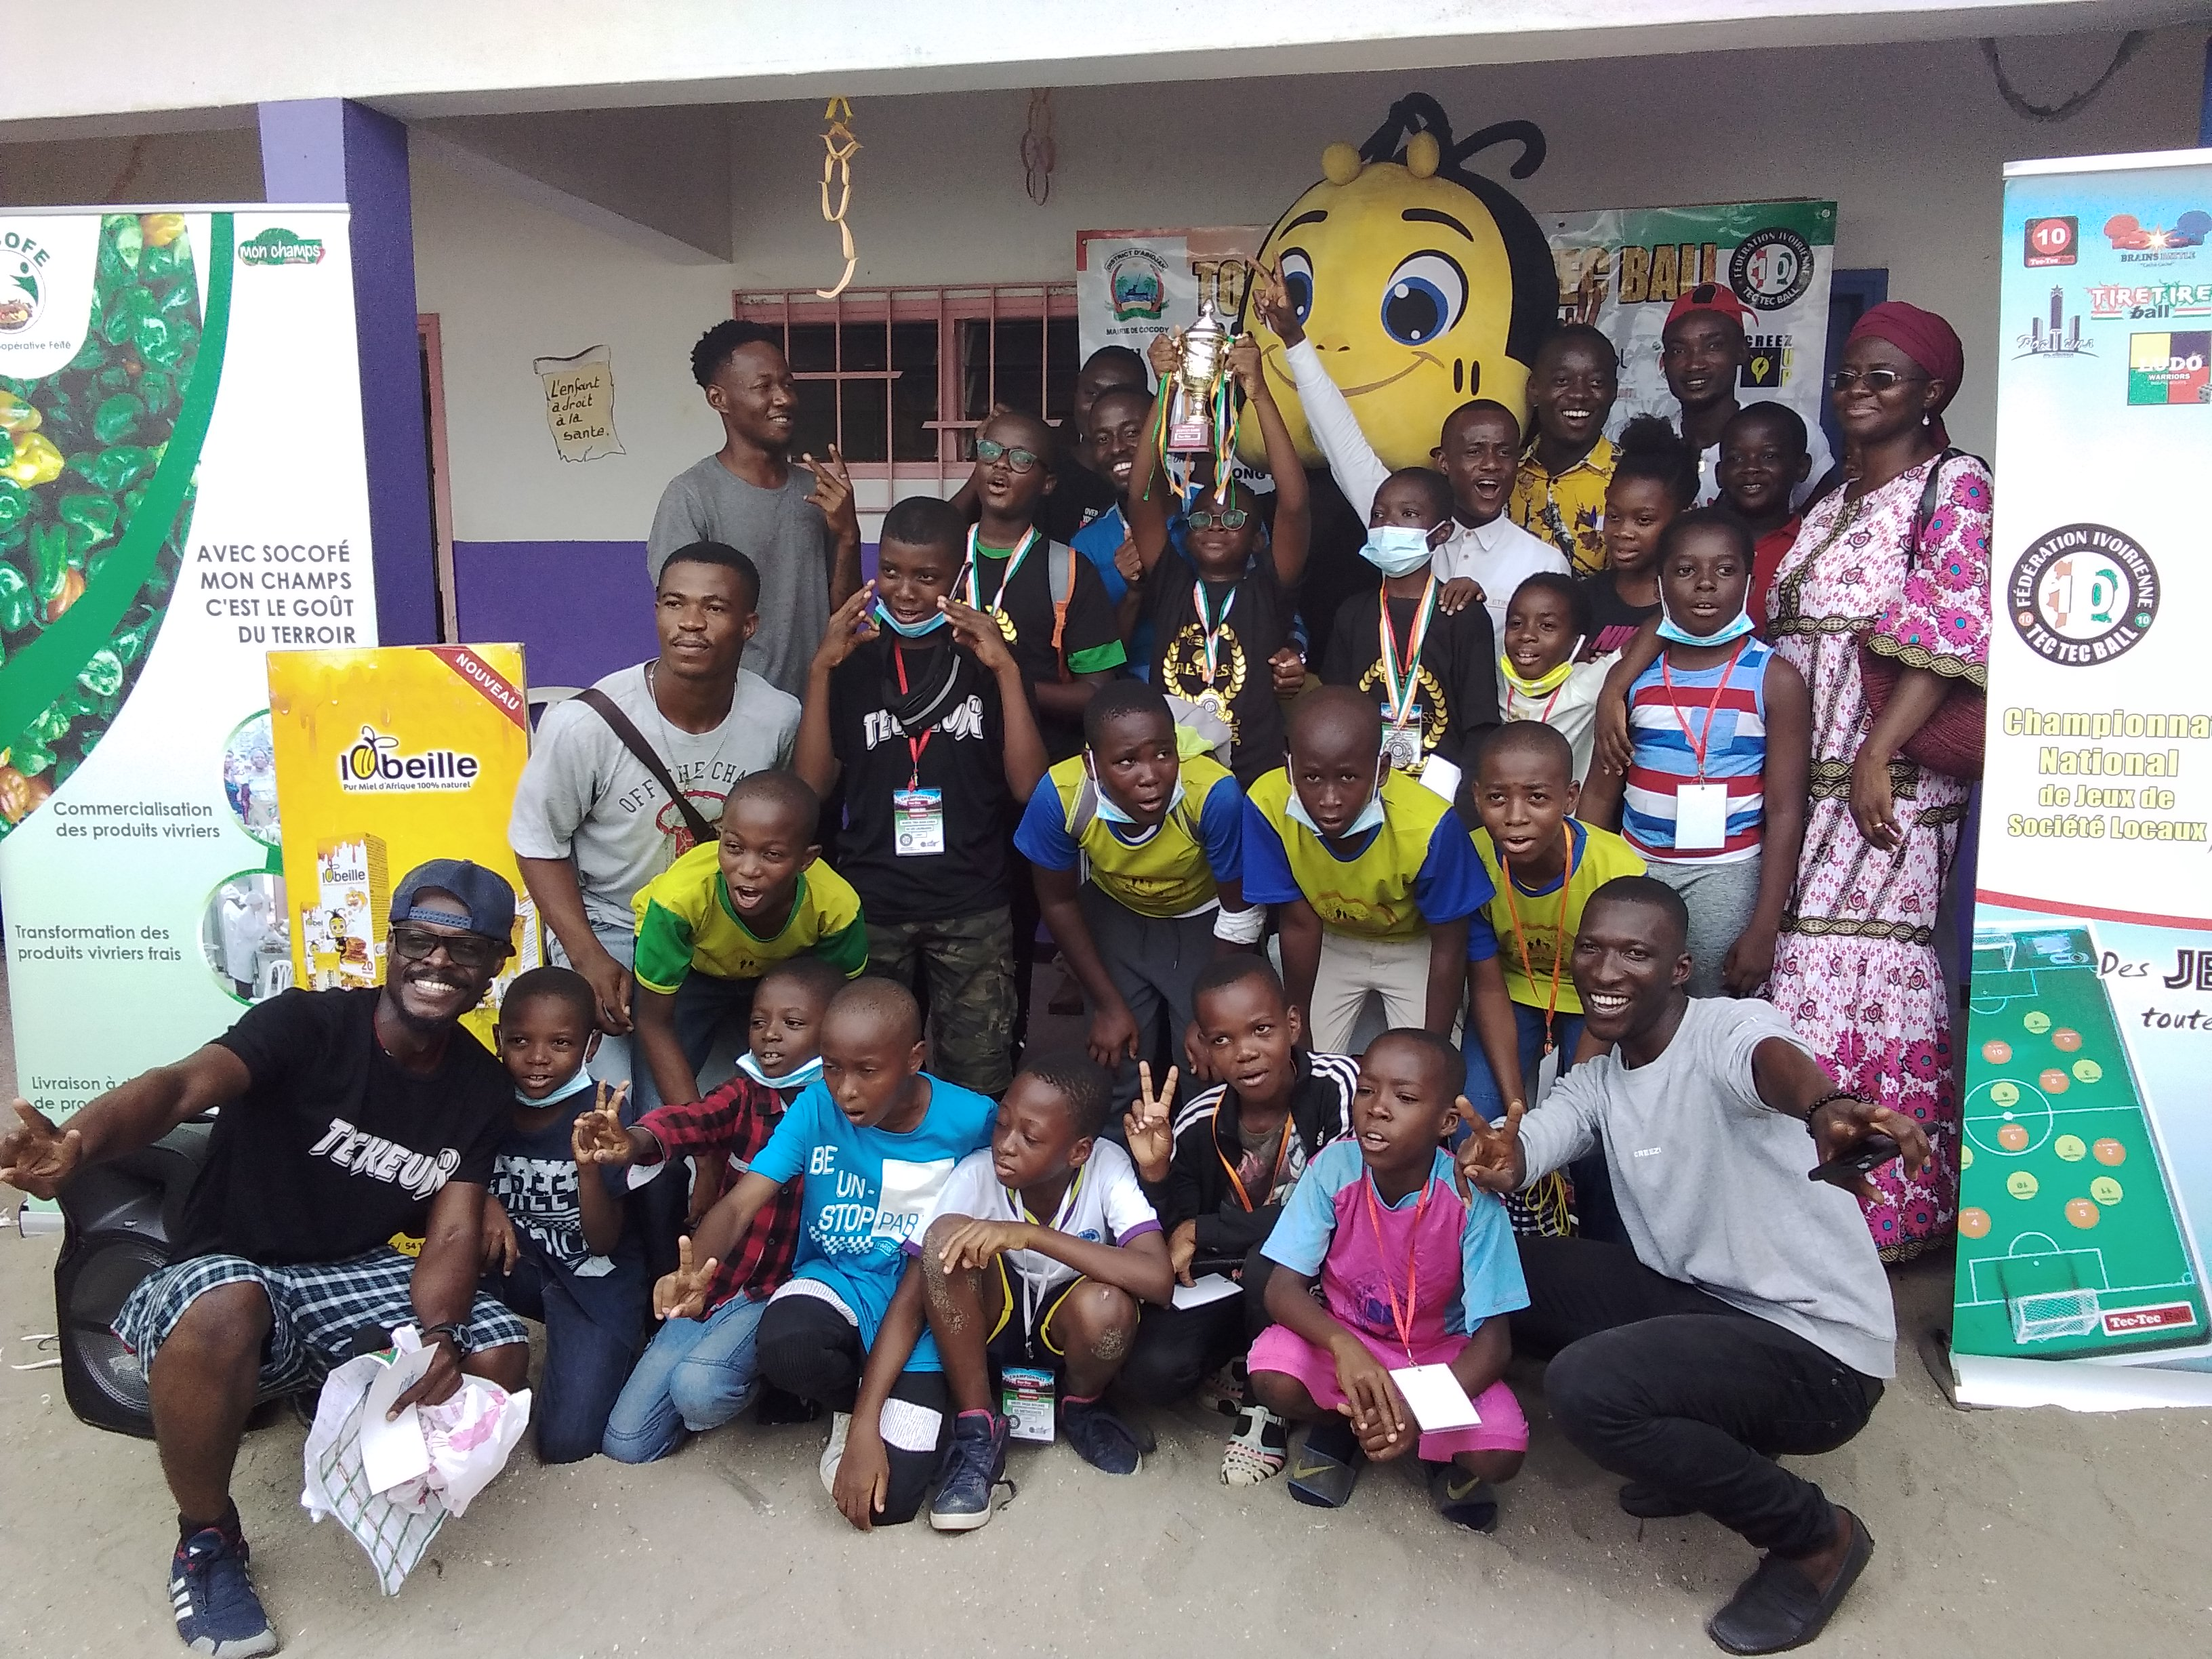 federation-ivoirienne-de-tec-tec-ball-un-appel-a-sponsors-lance